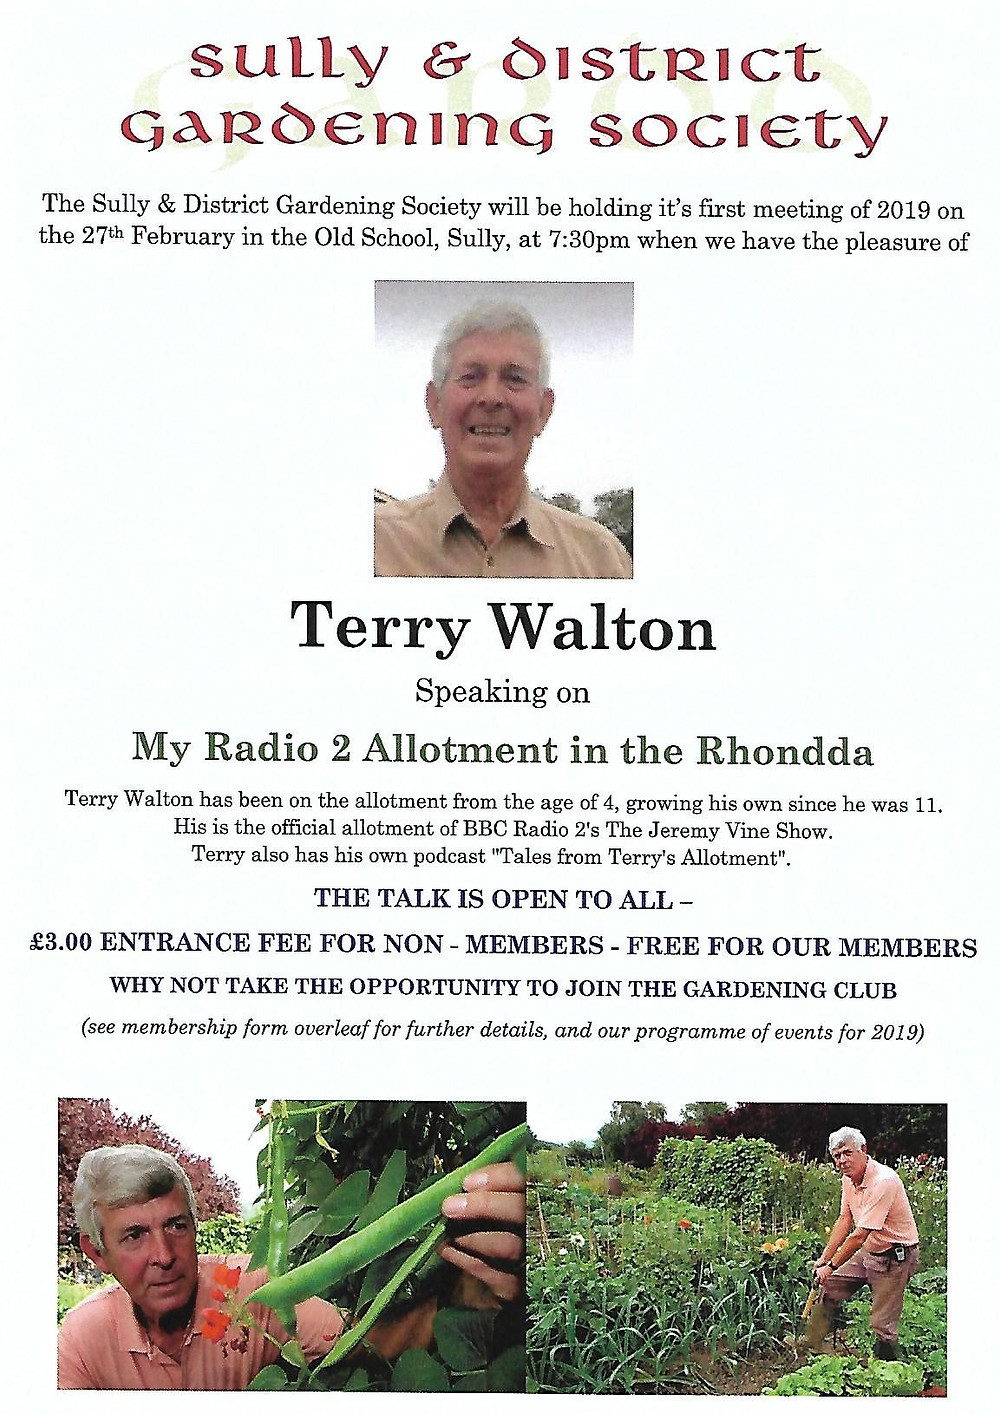 Terry Walton Poster